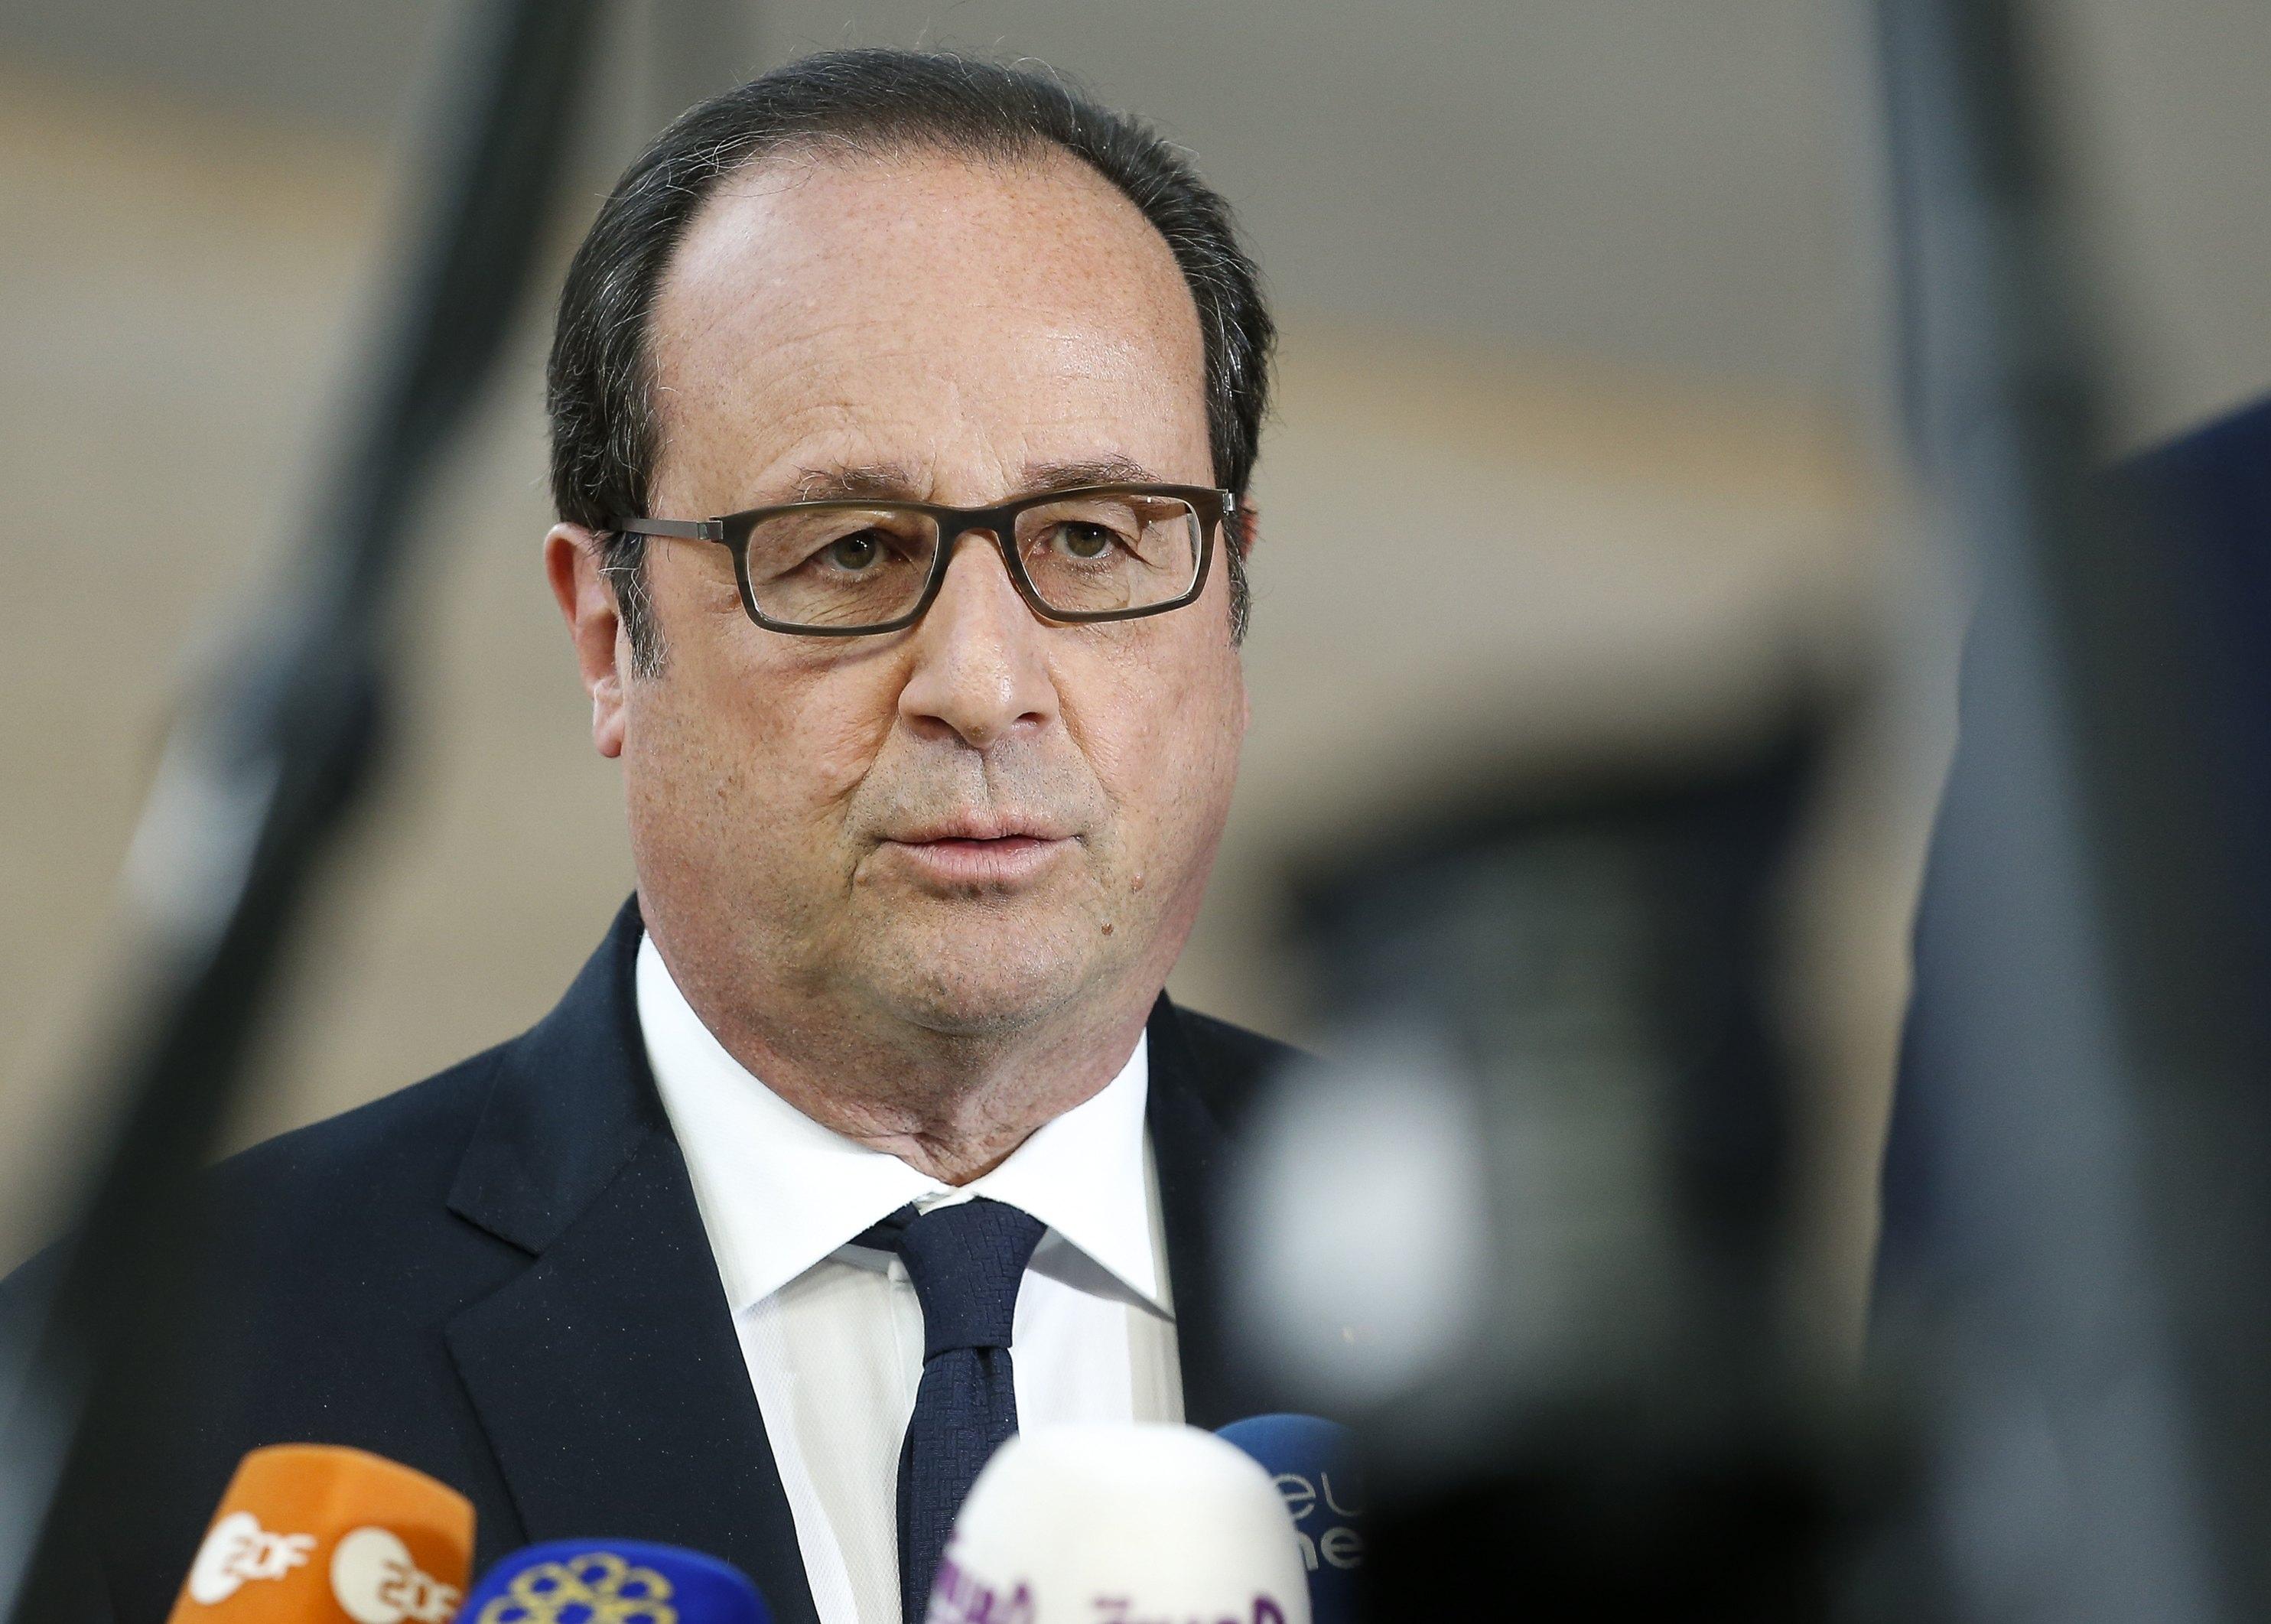 Francois Hollande, predsjednik koji je htio biti 'normalan'